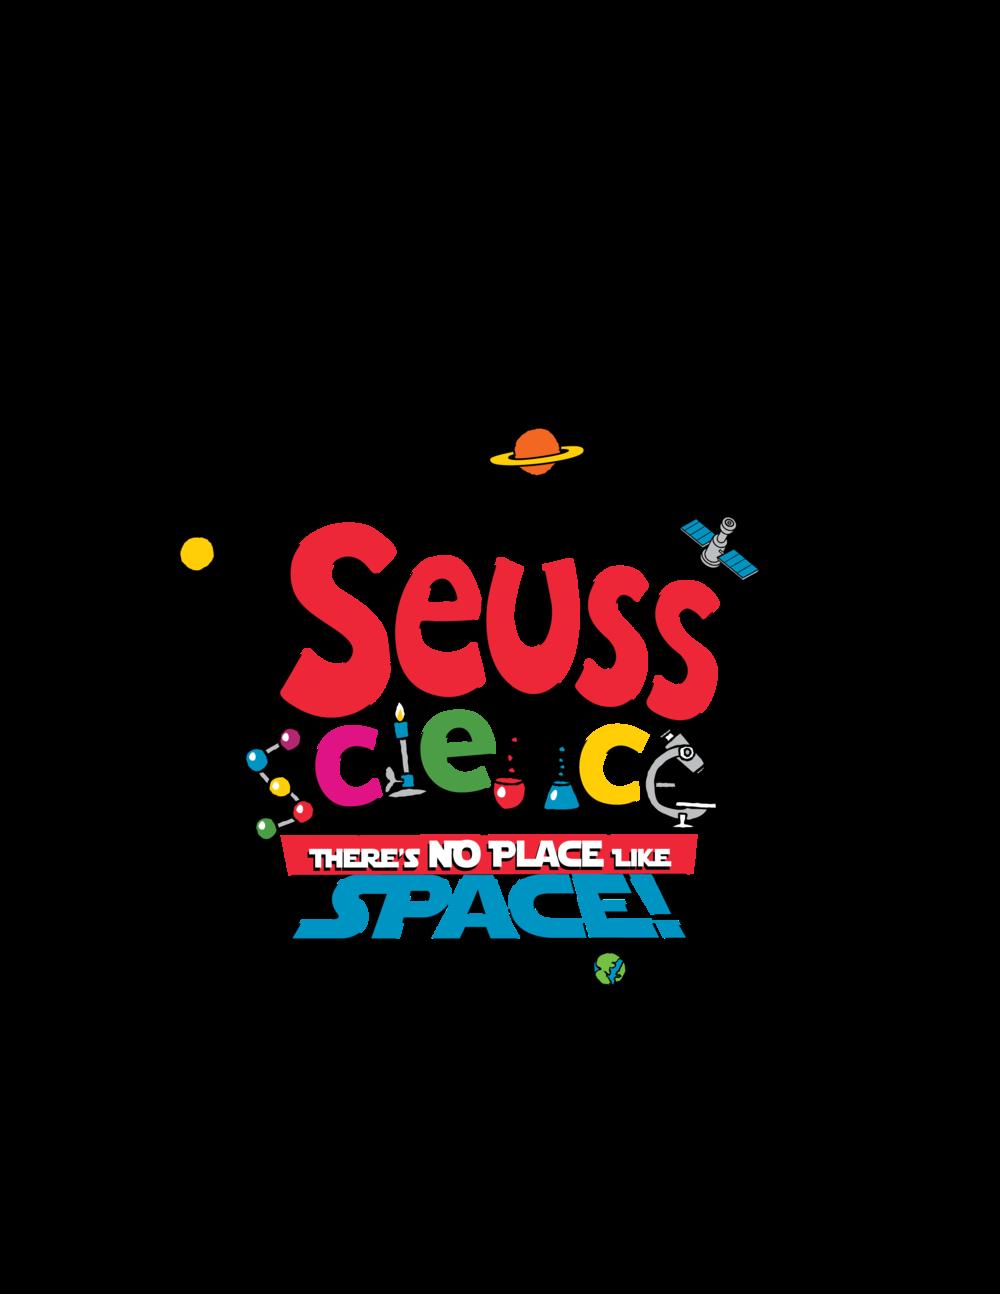 SEUSS_SPACE_LOGO_03.png